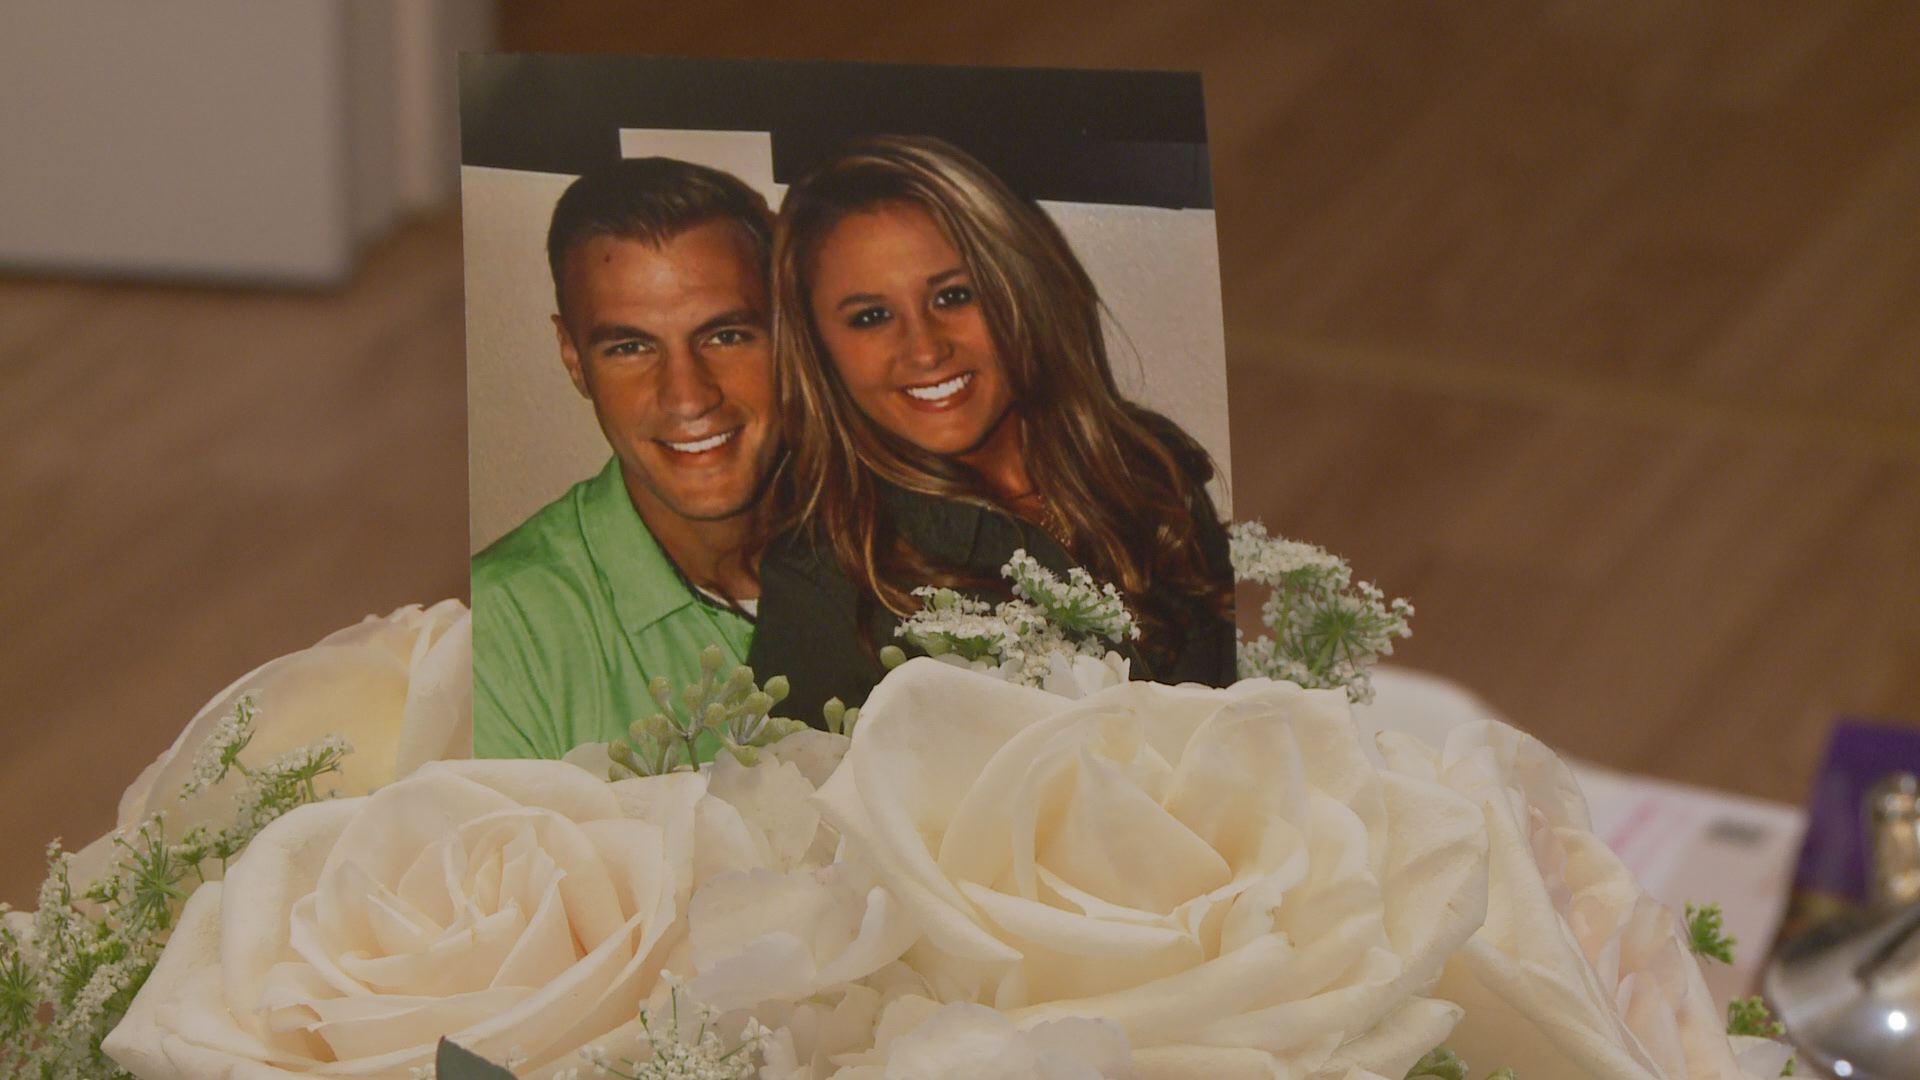 Surprise Wedding Gift For Groom : Vendors surprise bride, groom battling leukemia with free wedding ...